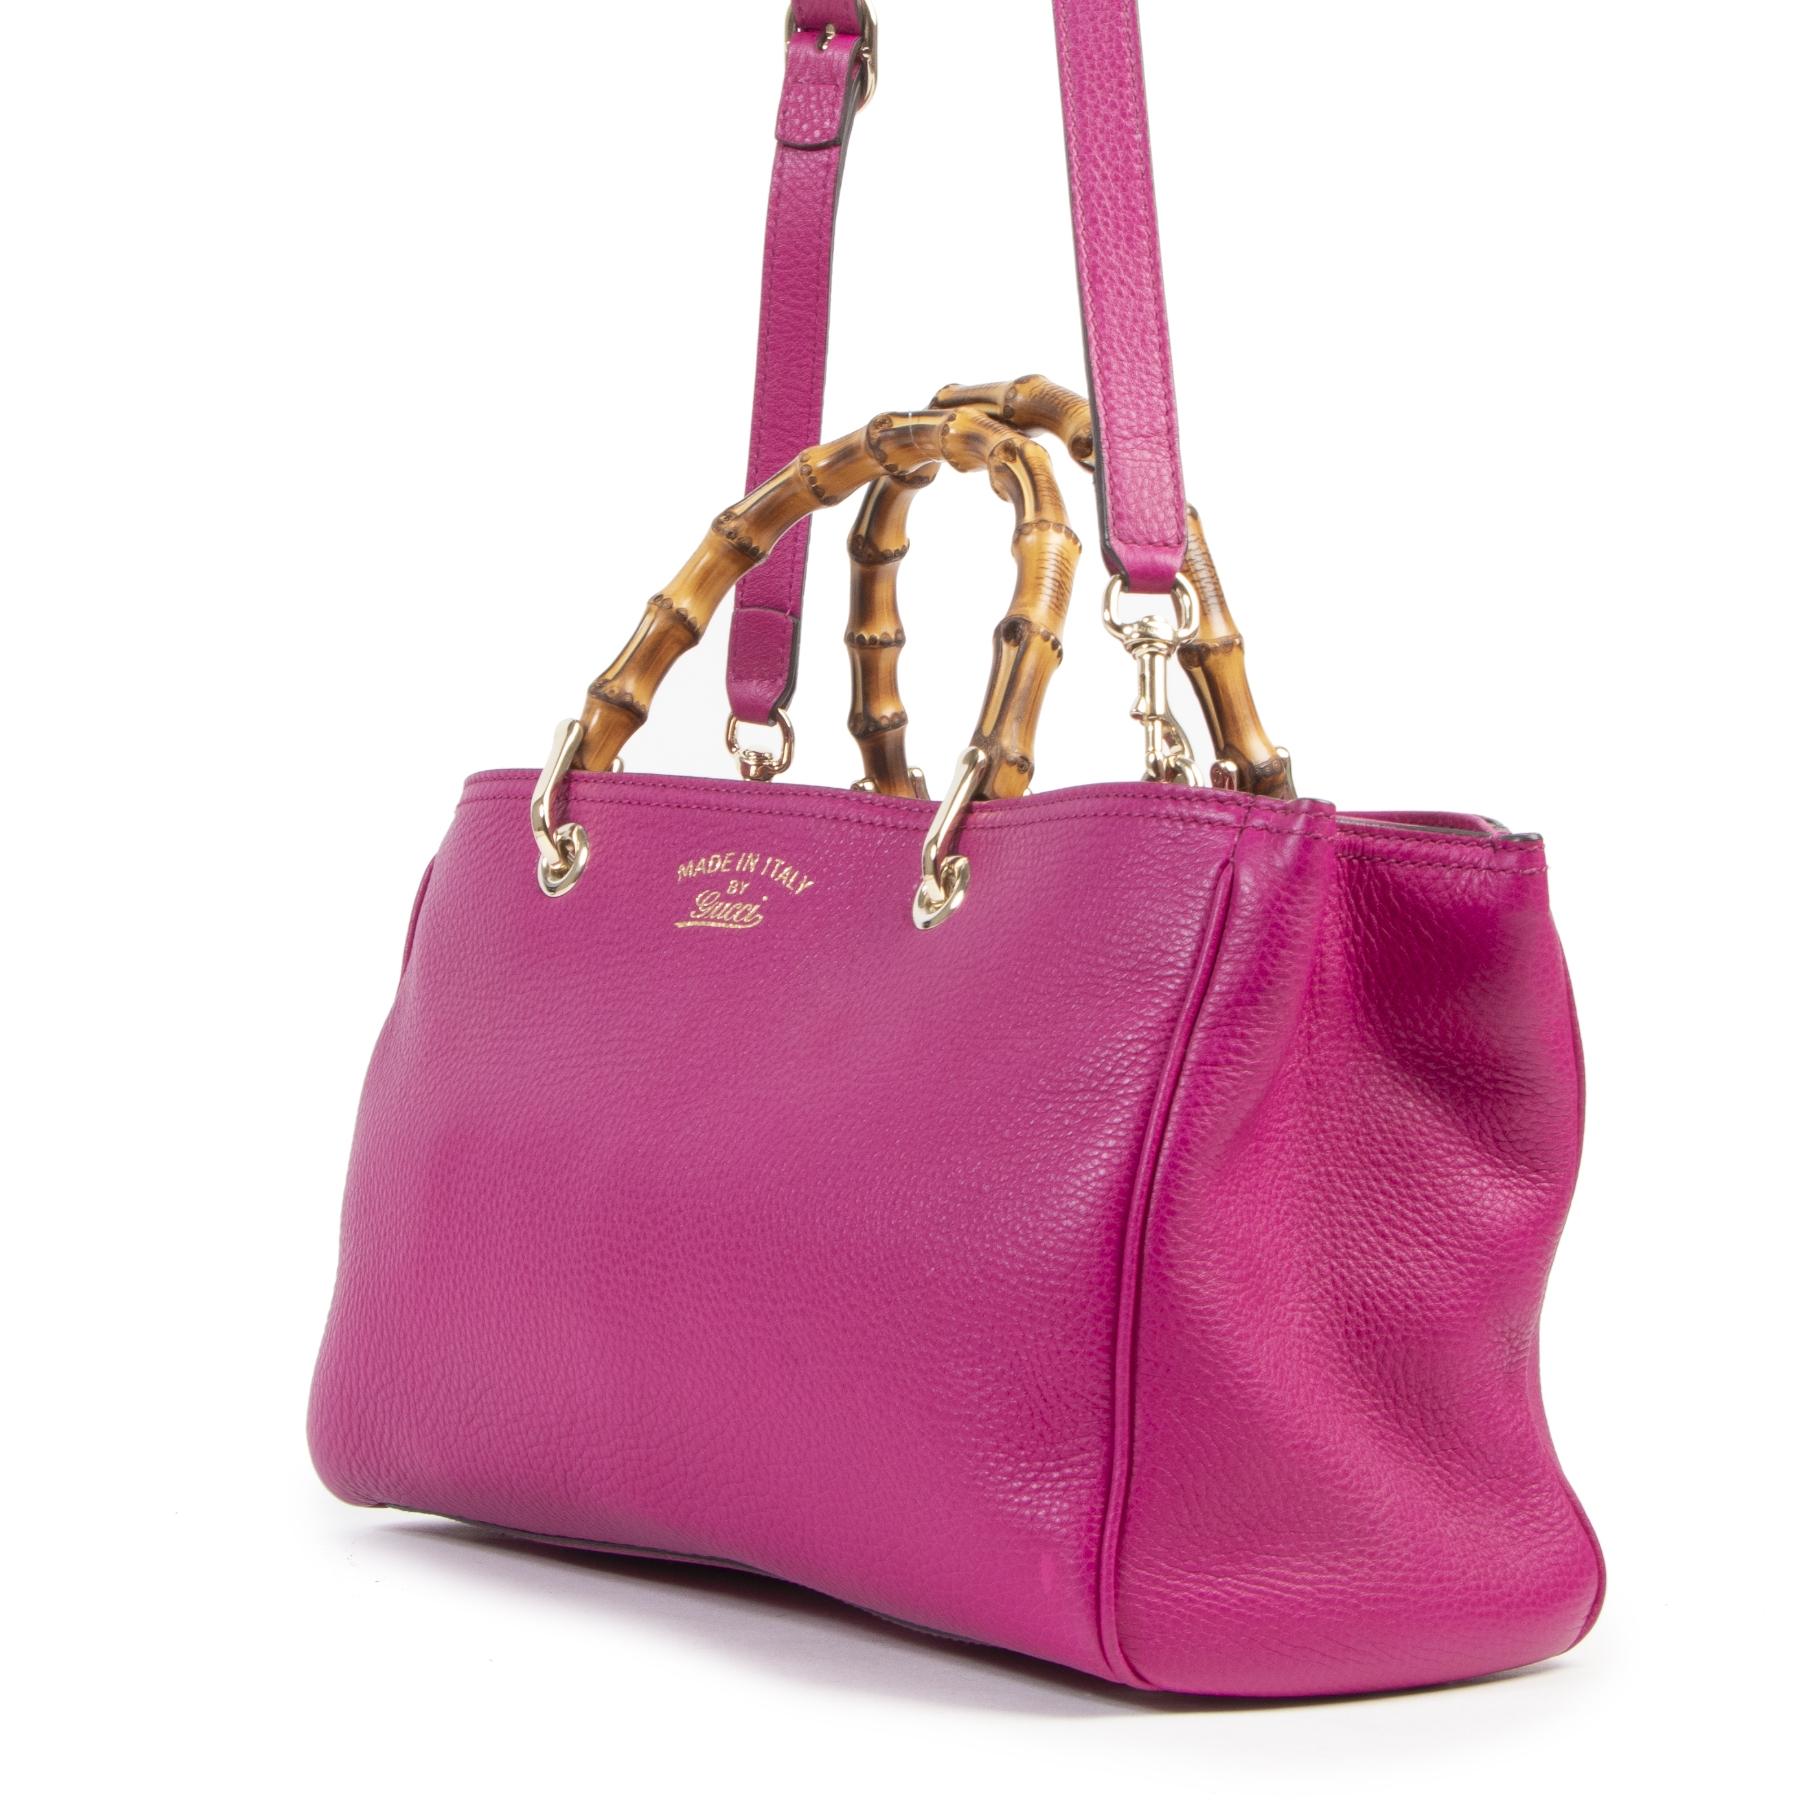 Gucci Fuchsia Bamboo Top Handle Bag